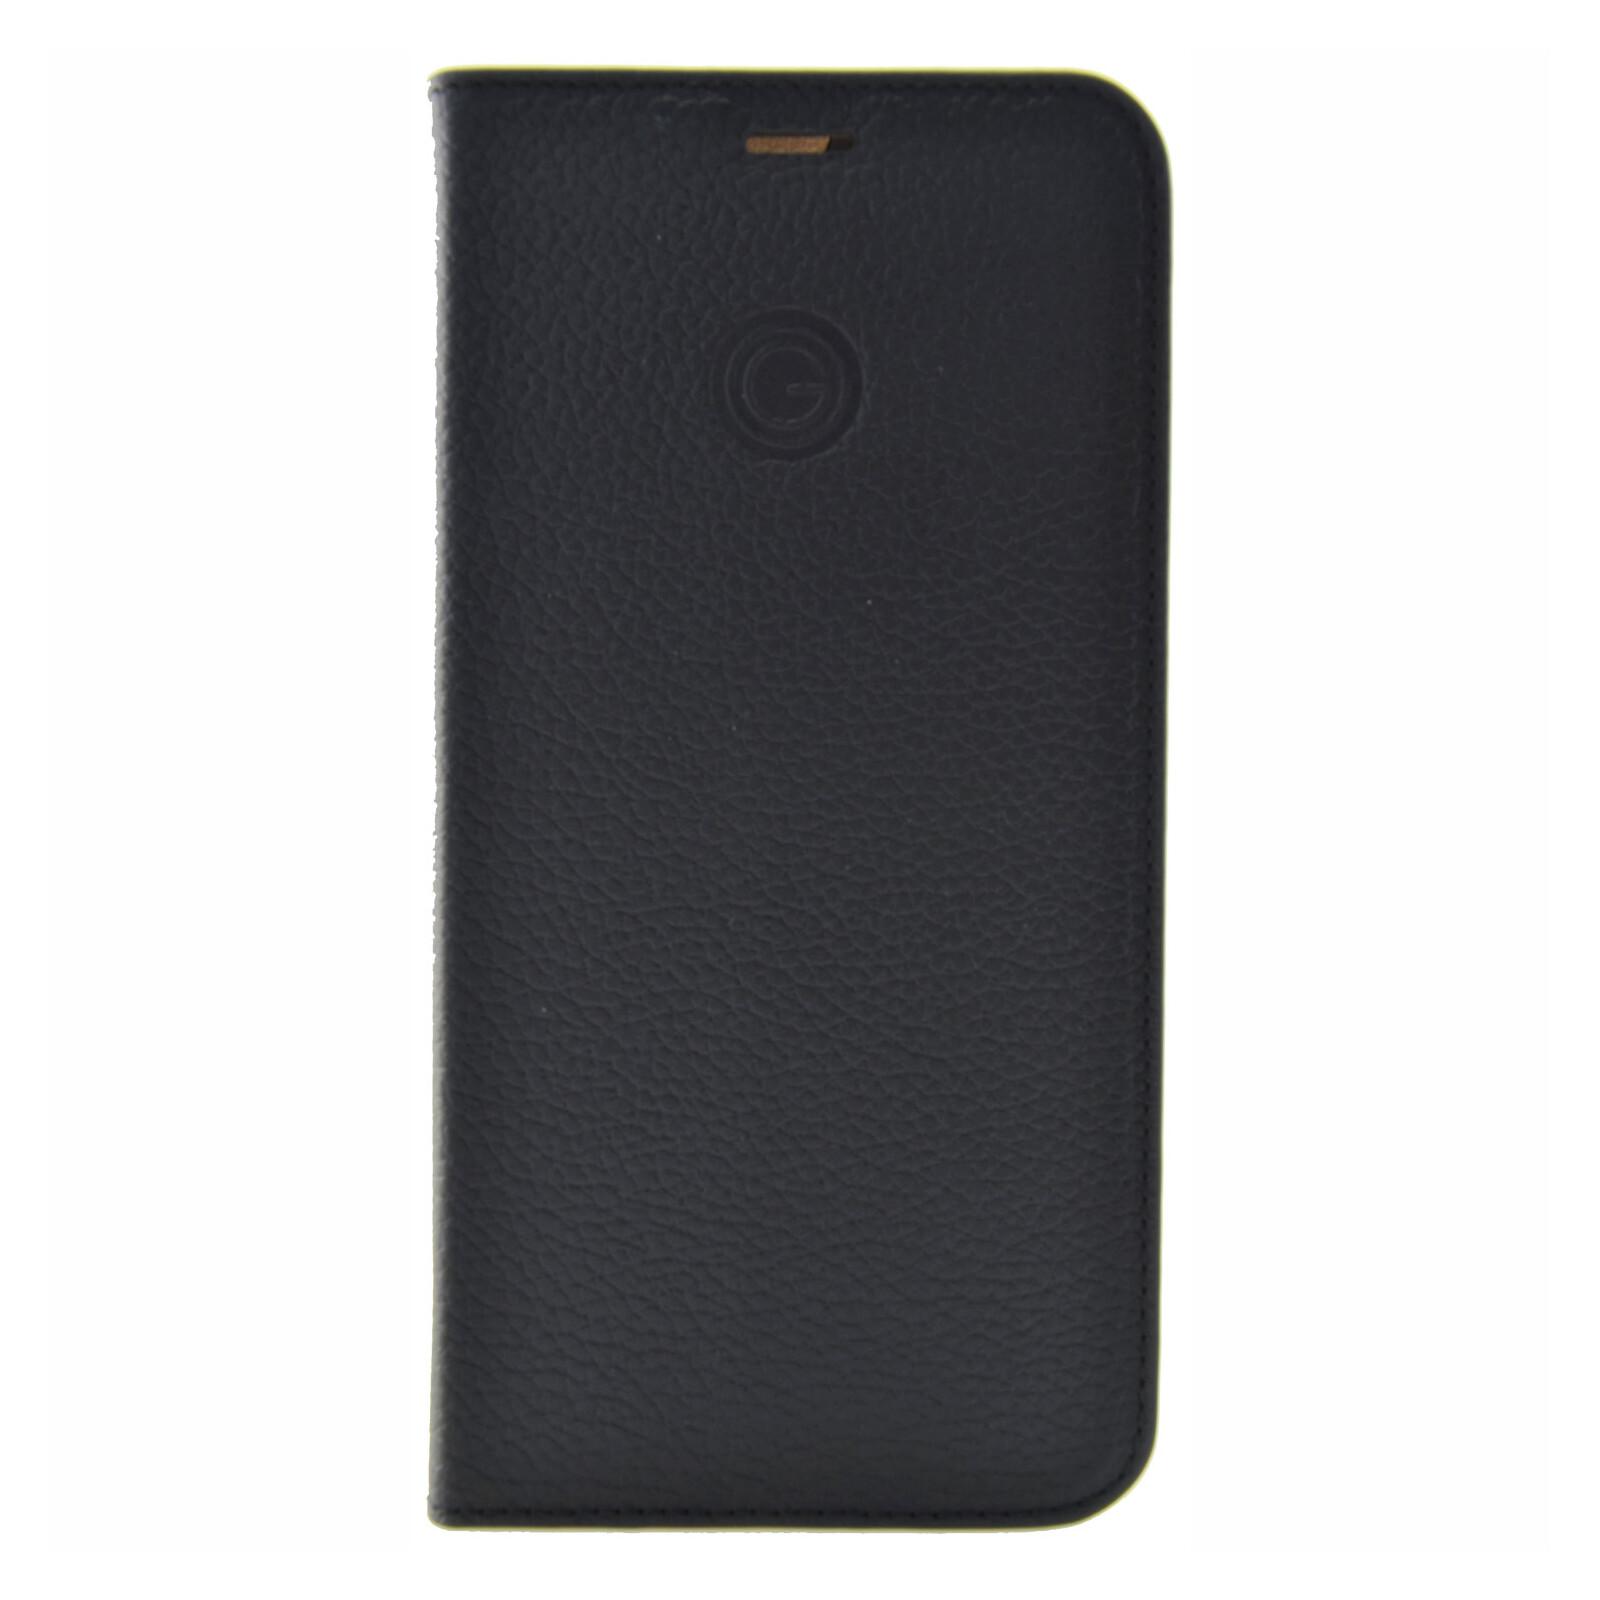 Galeli Booktasche MARC Apple iPhone 12 Pro Max schwarz